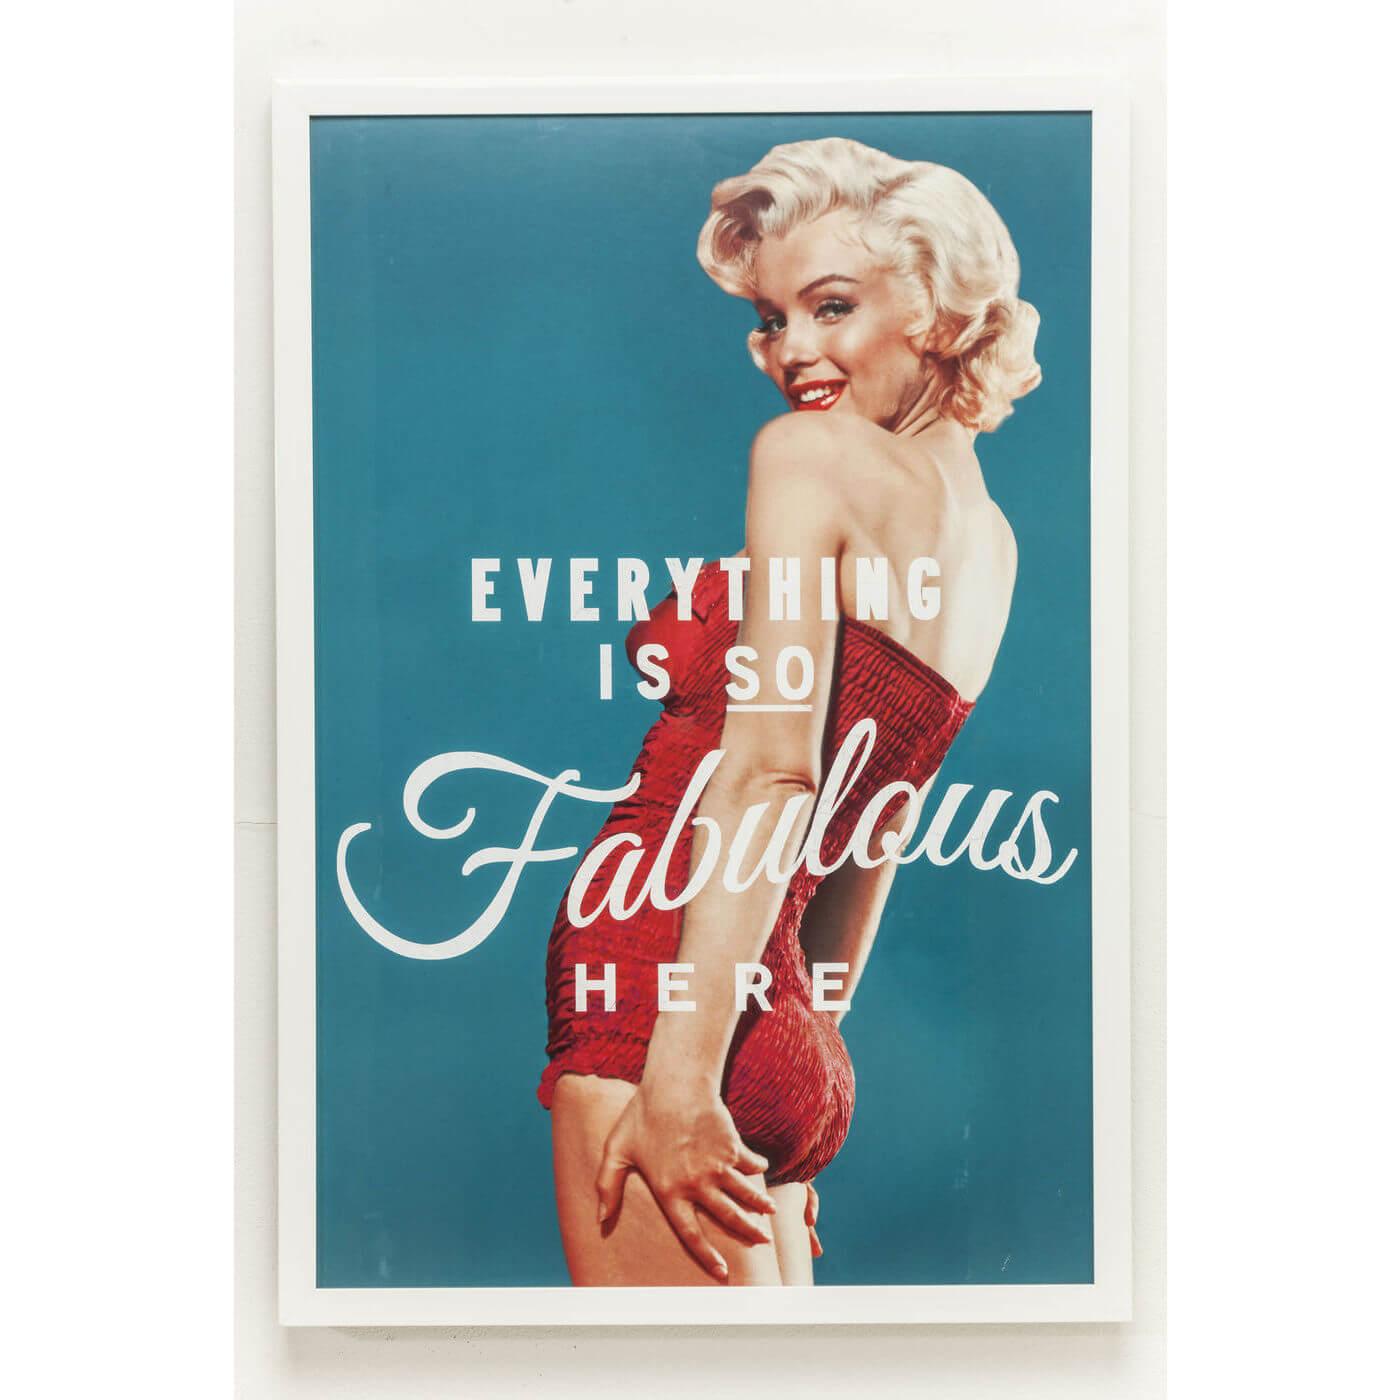 Kare design, plakat fabulous - blå/creme/rød, m. ramme, (64x94cm) fra kare design på boboonline.dk